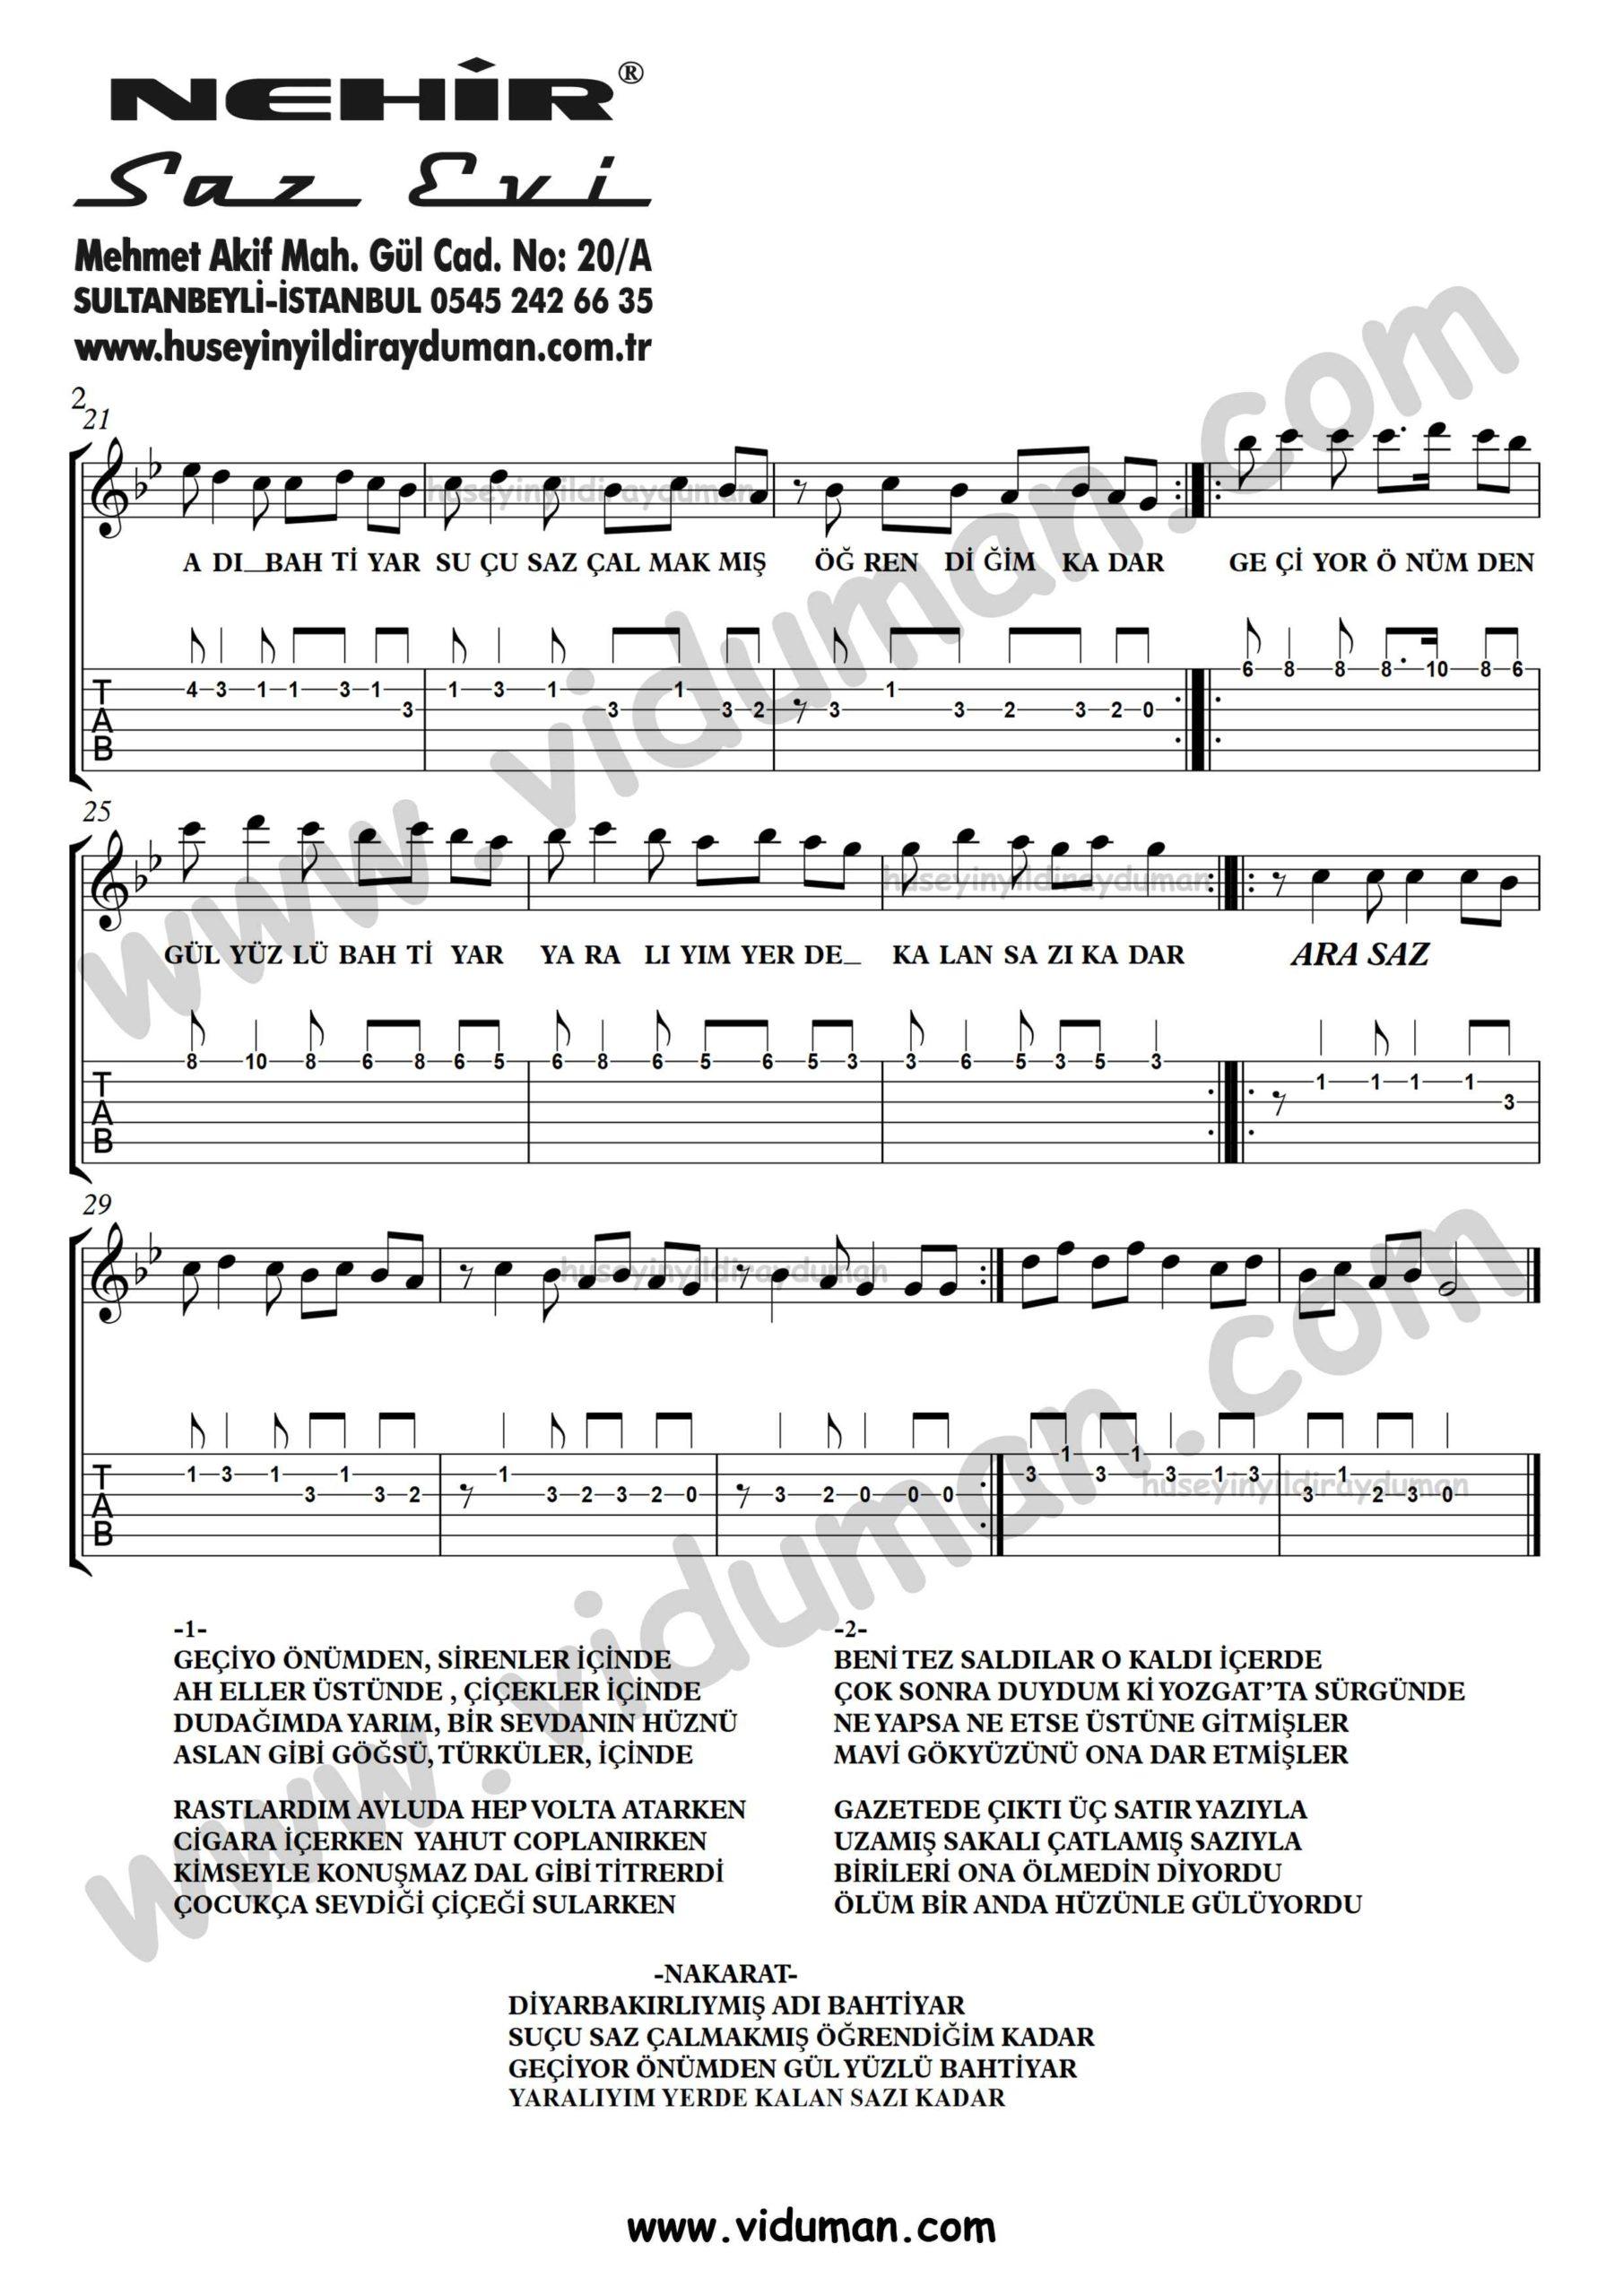 Bahtiyar_2-Ahmet Kaya-Gitar Tab-Solo Notalari